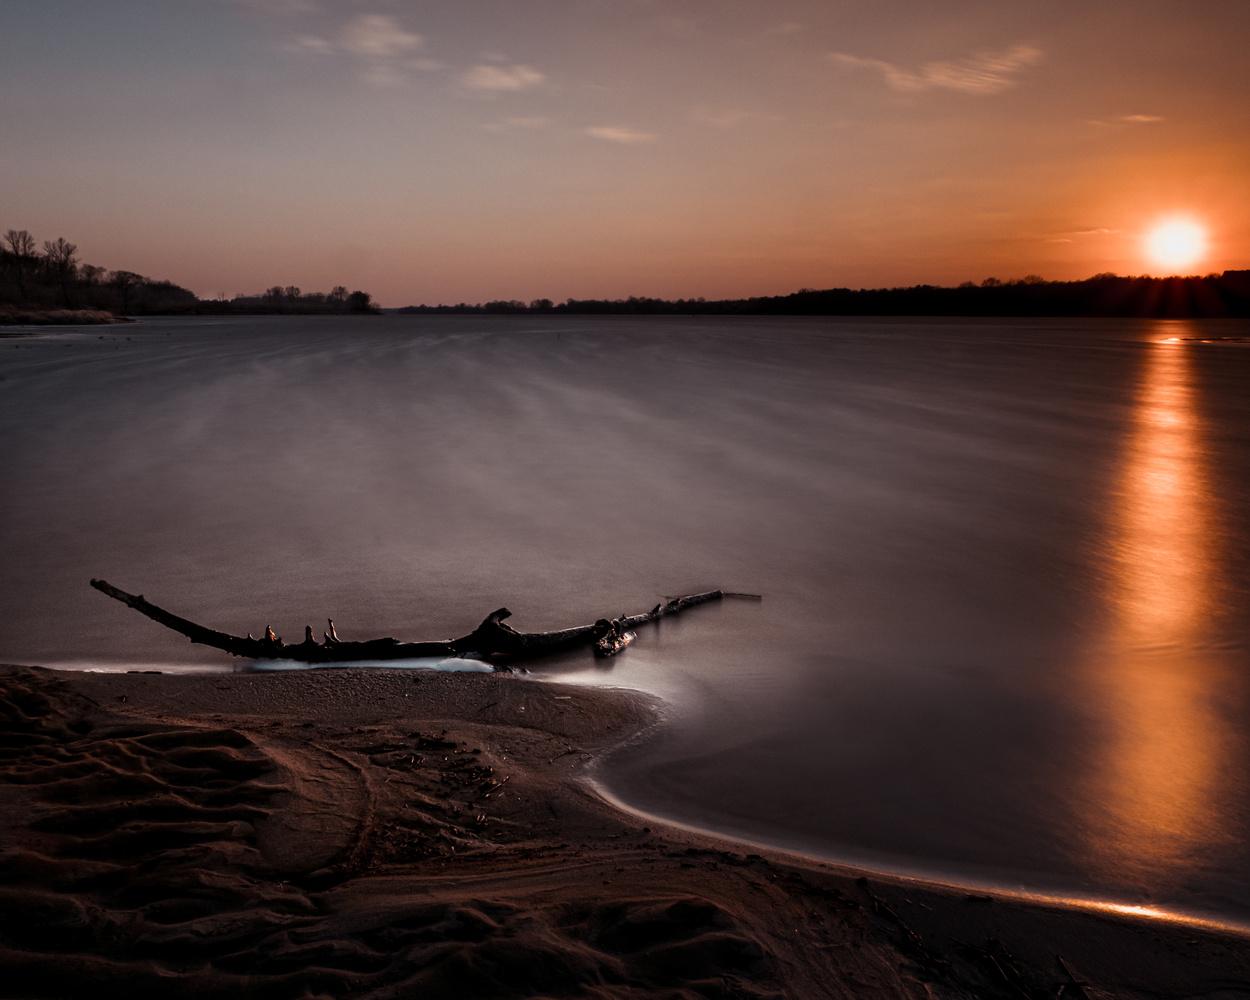 Vistula riwer by Jerzy Wolochowicz